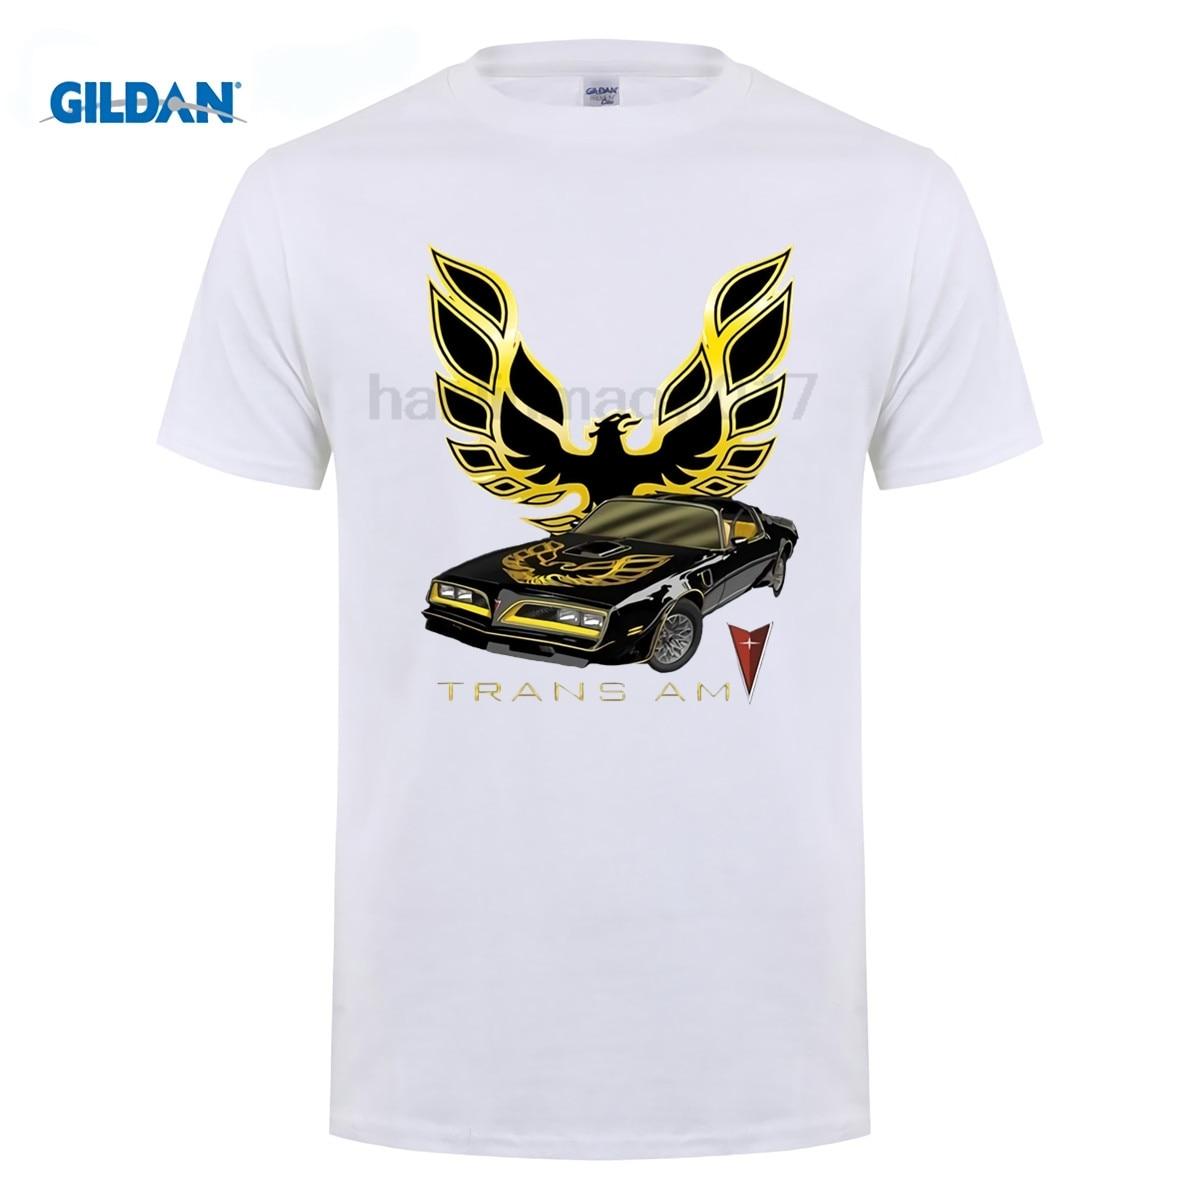 Summer New Men T-Shirt Trans Am Automobile Car white T Shirt asian S-XXXL Size Mens Shirts Short Sleeve Trend Clothing